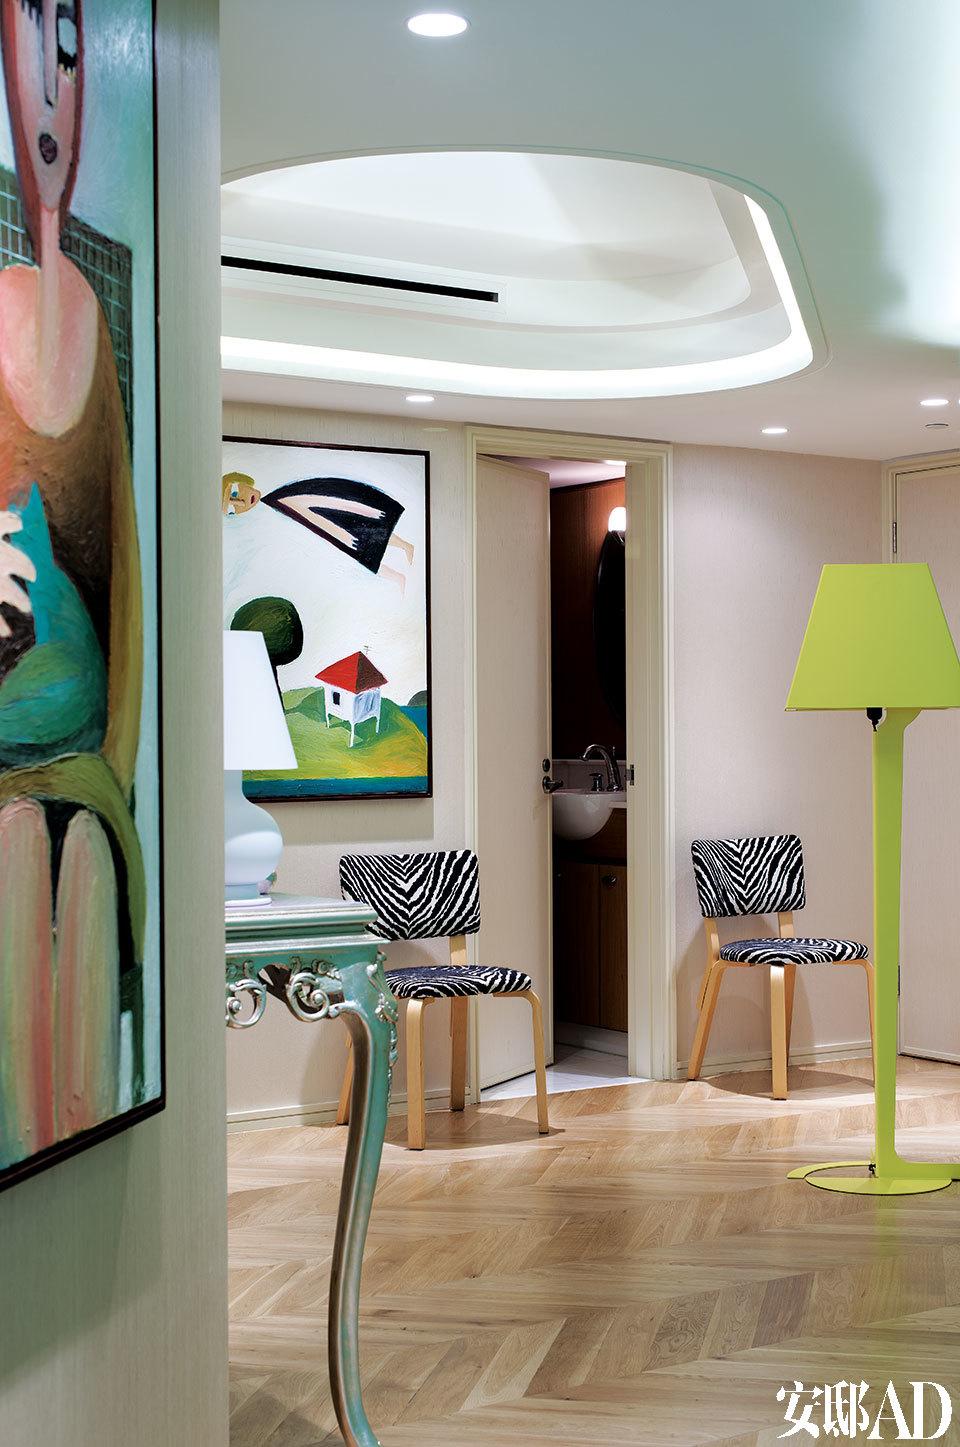 [After] Artek斑马纹座椅和Established&Sons的Fold T2系列落地灯为入口处的小客厅赋予了轻松明快的气质。